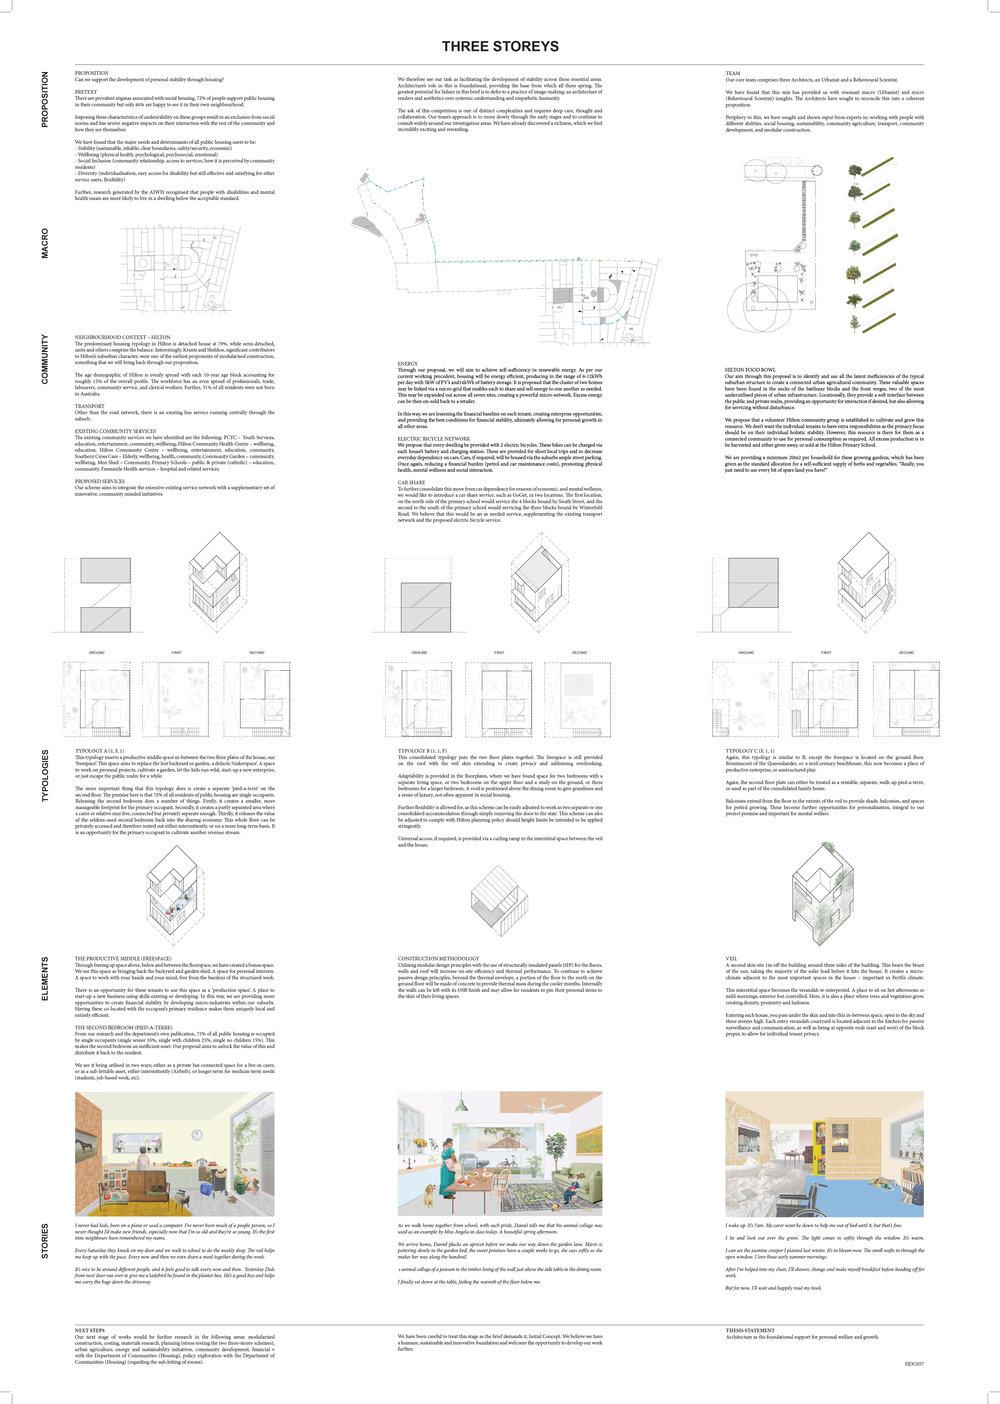 HDC057_103_HILTON - A1 FINAL_SML1.jpg